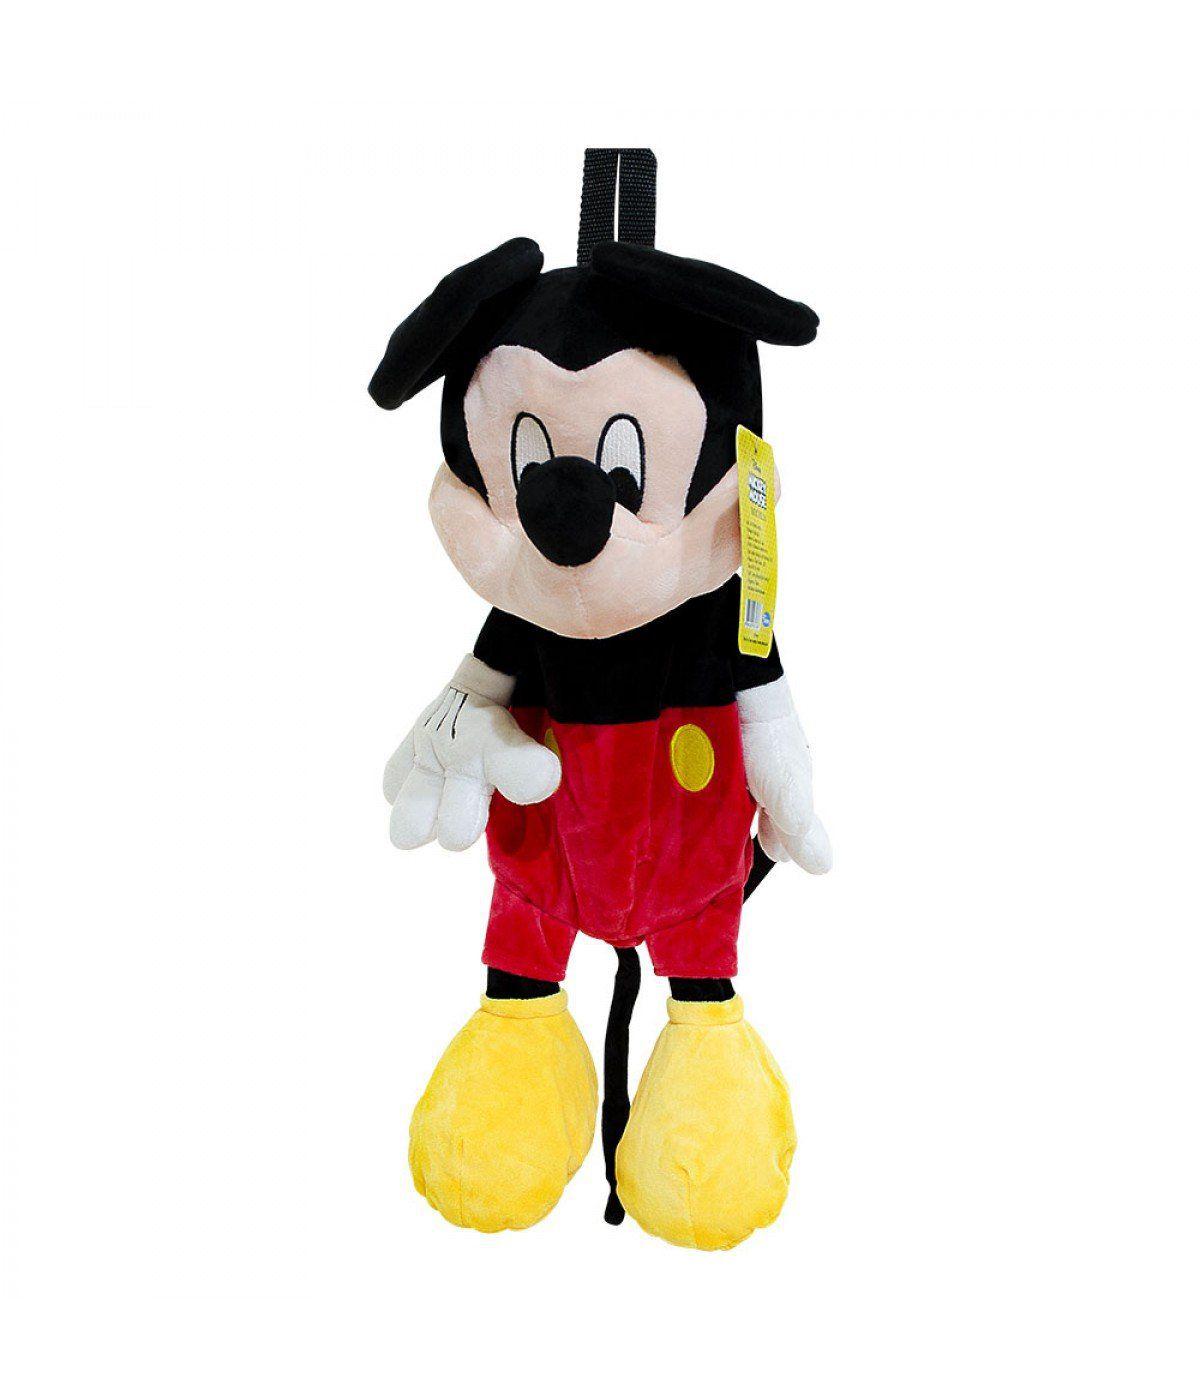 Mochila de Pelúcia Mickey Mouse (Disney)